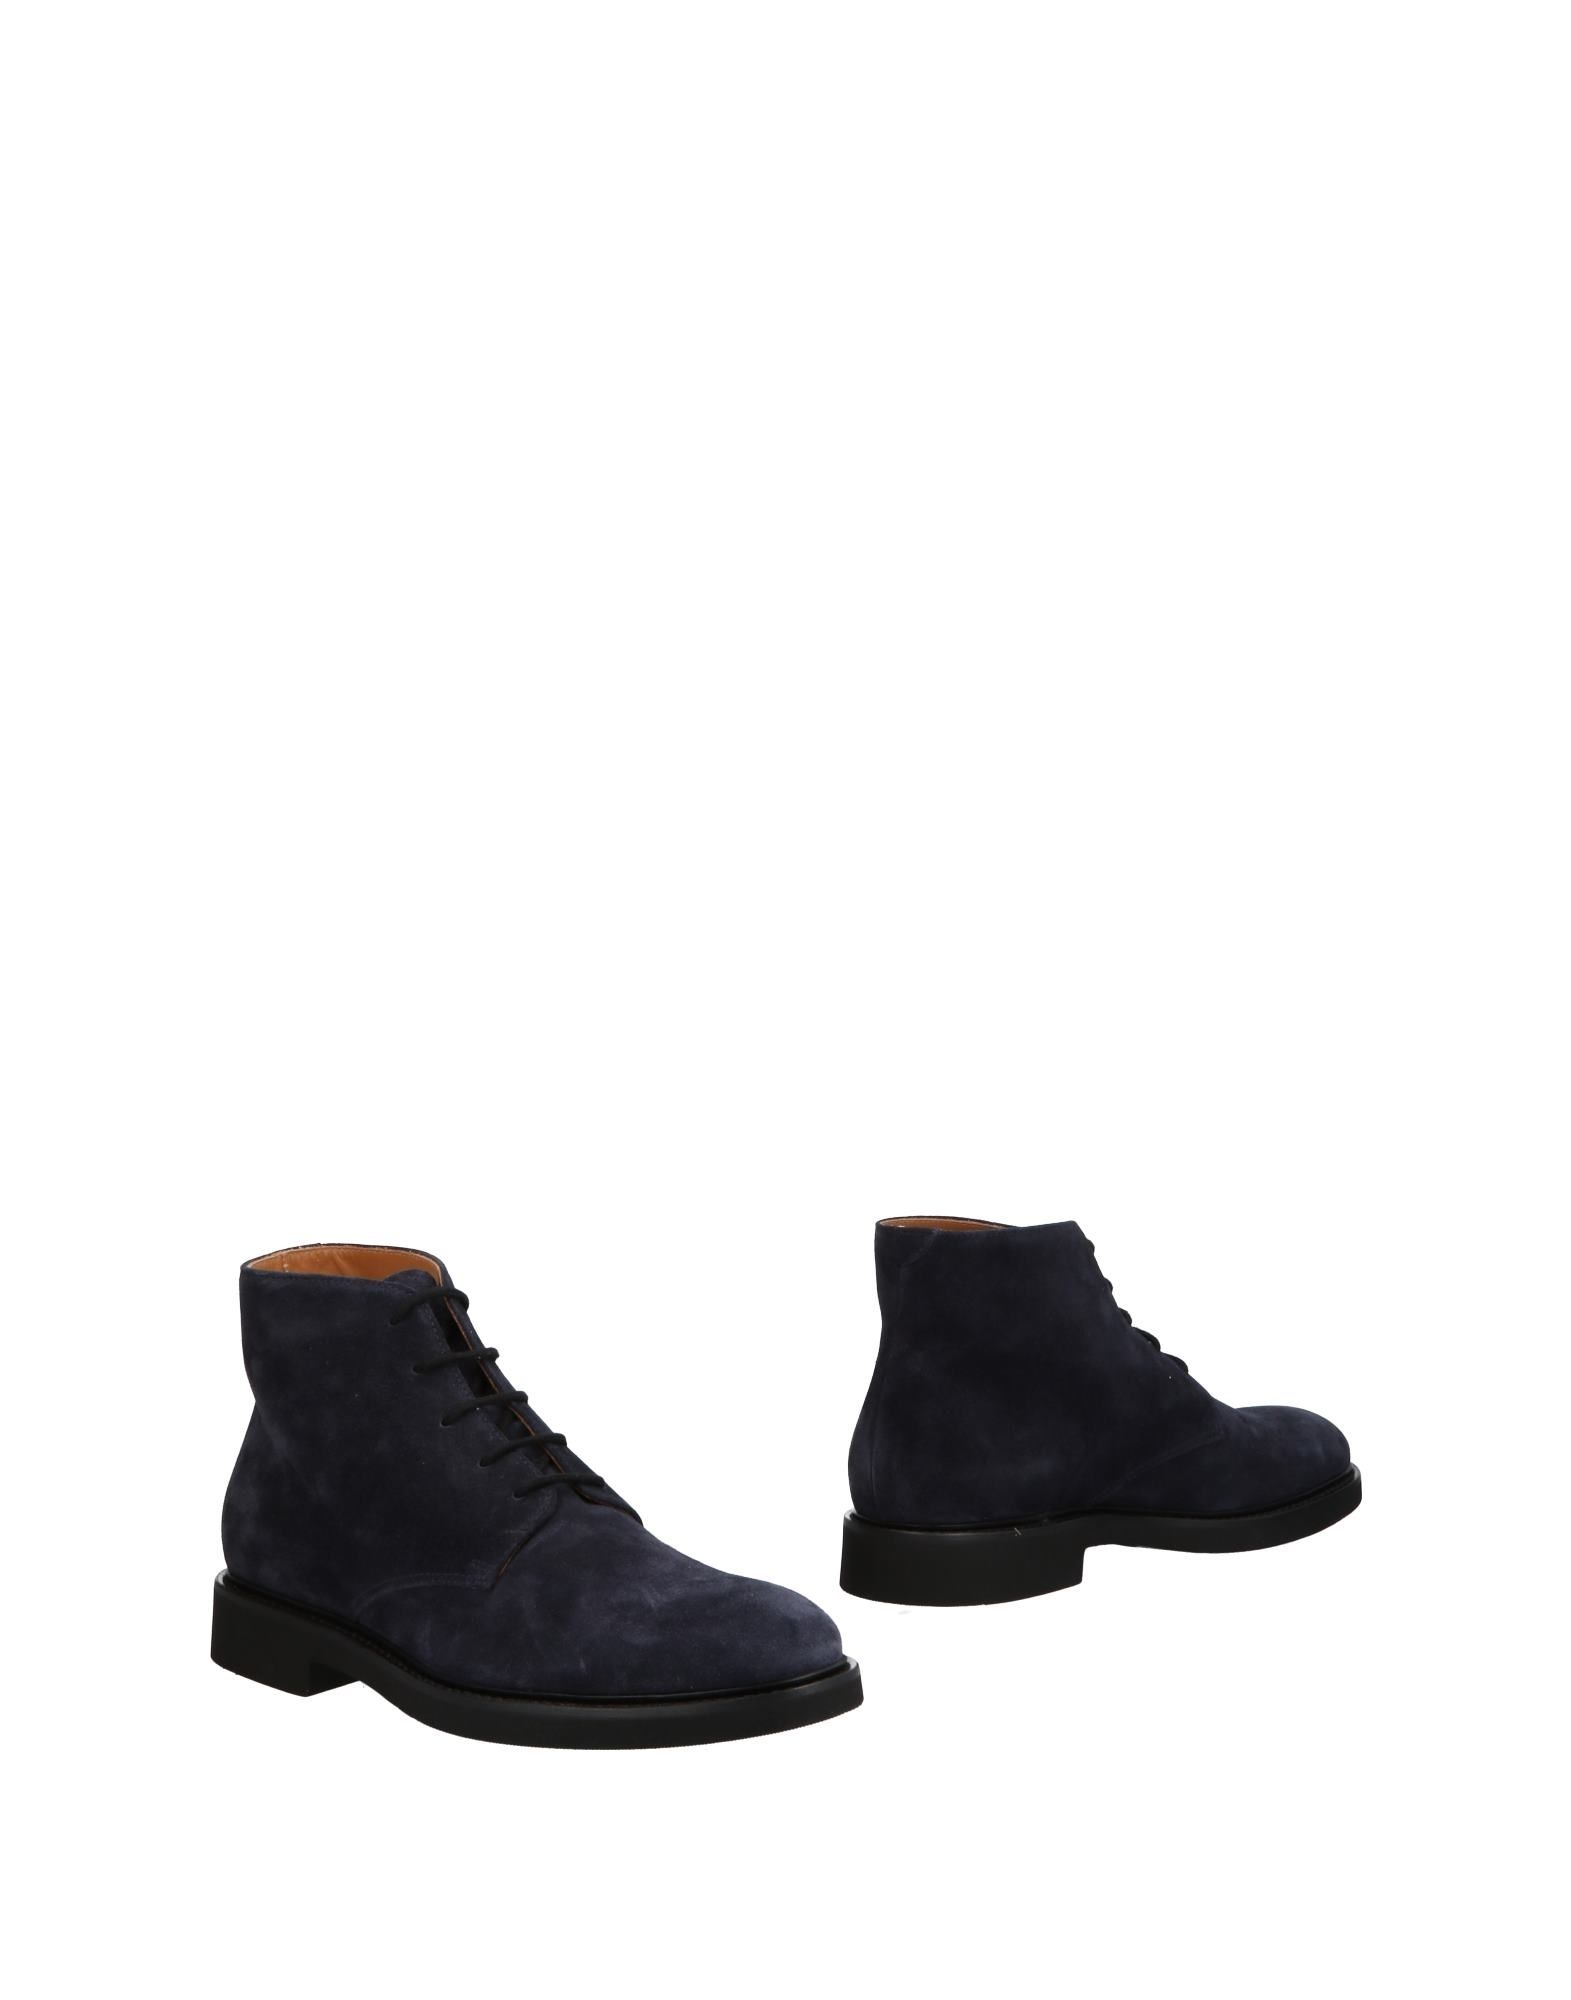 Doucal's Stiefelette Herren  11506382JK Gute Qualität beliebte Schuhe